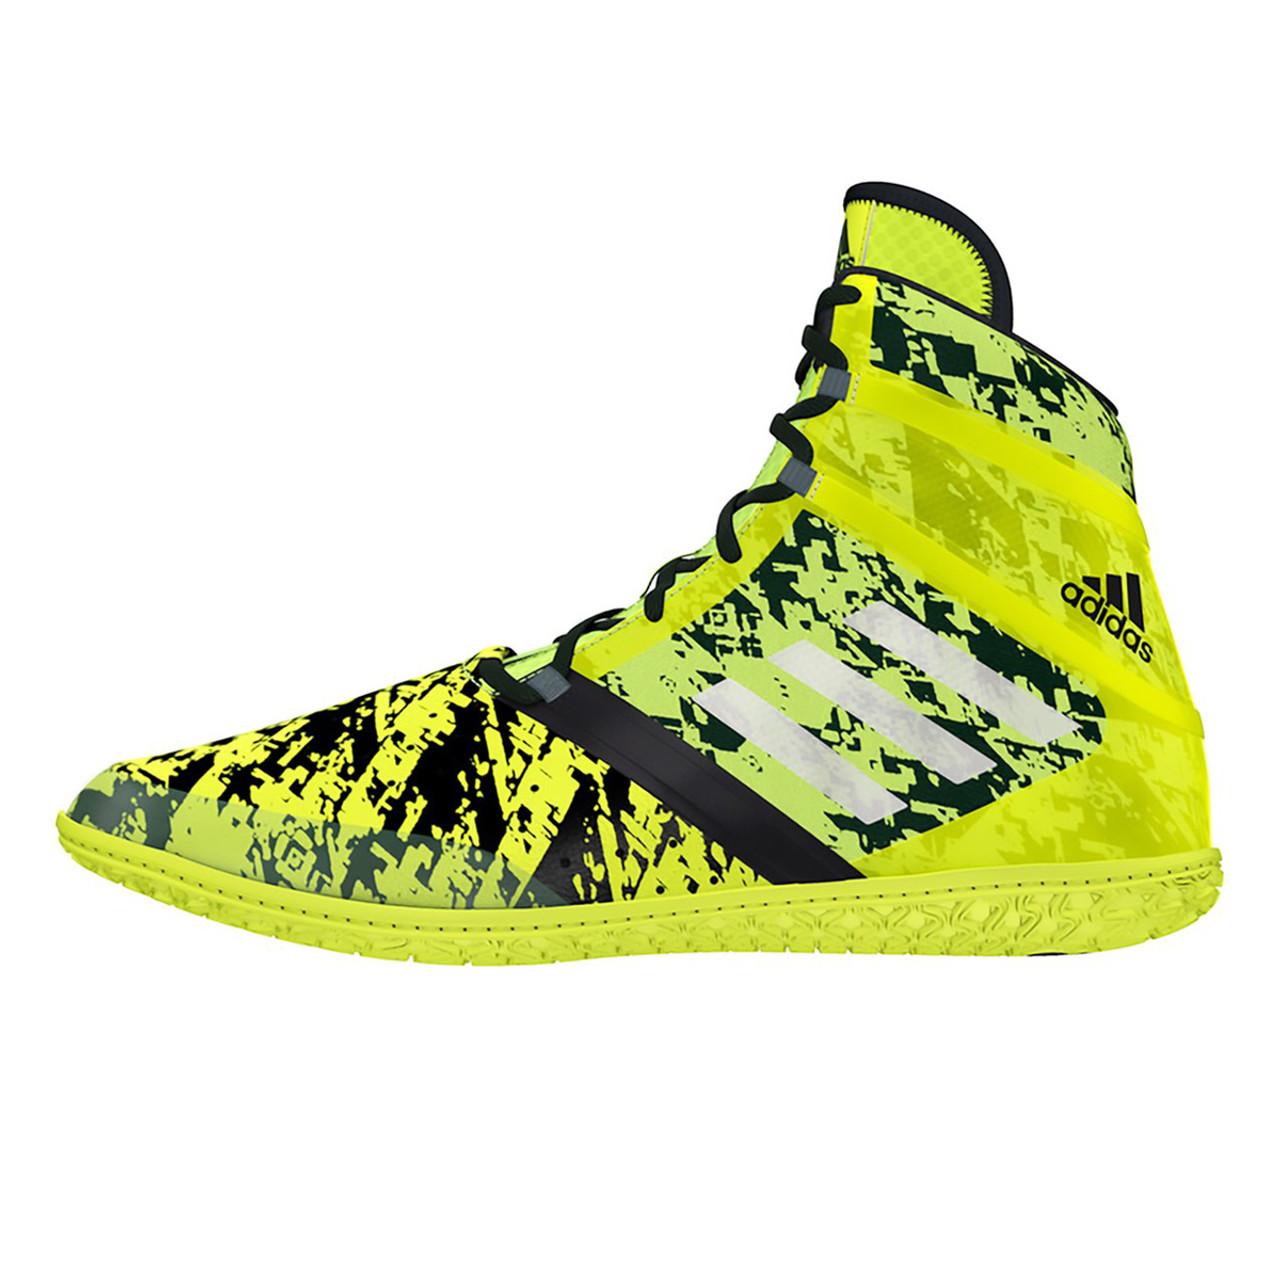 Green 25e1f Shoes Wrestling 2cfae Adidas Authentic xeBdCo